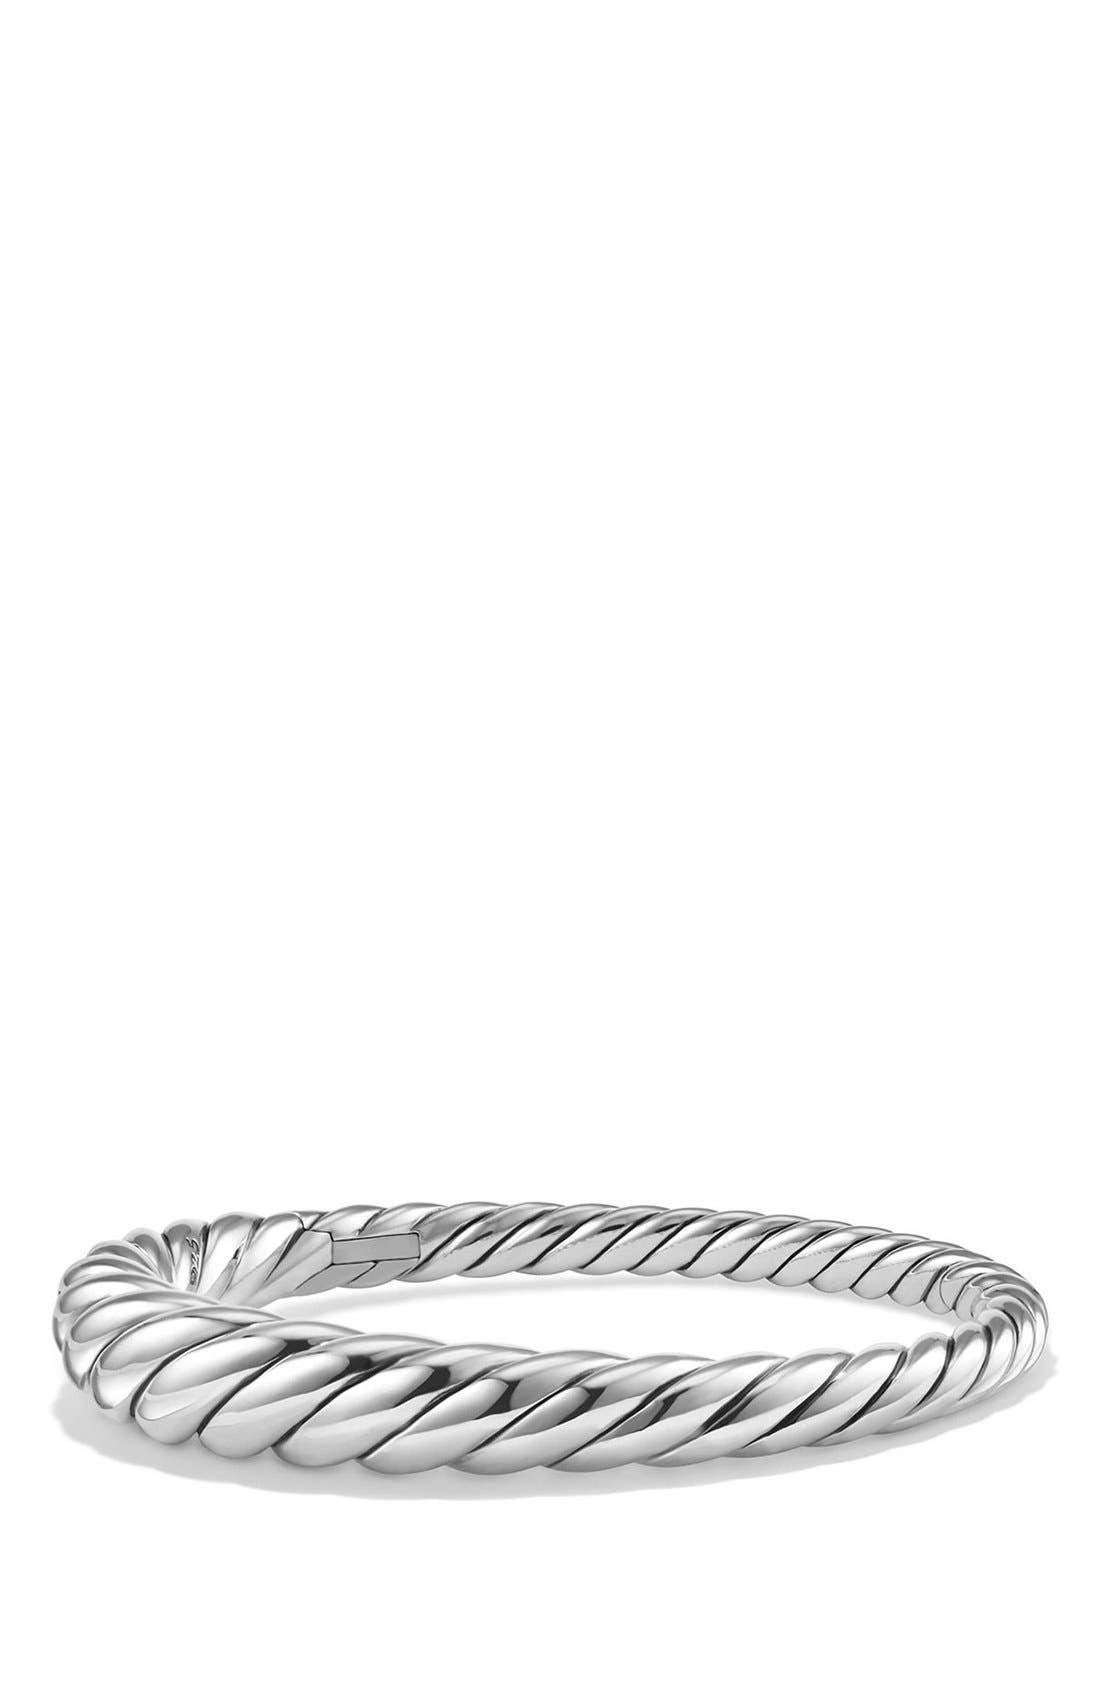 DAVID YURMAN, 'Pure Form' Small Cable Bracelet, Main thumbnail 1, color, SILVER